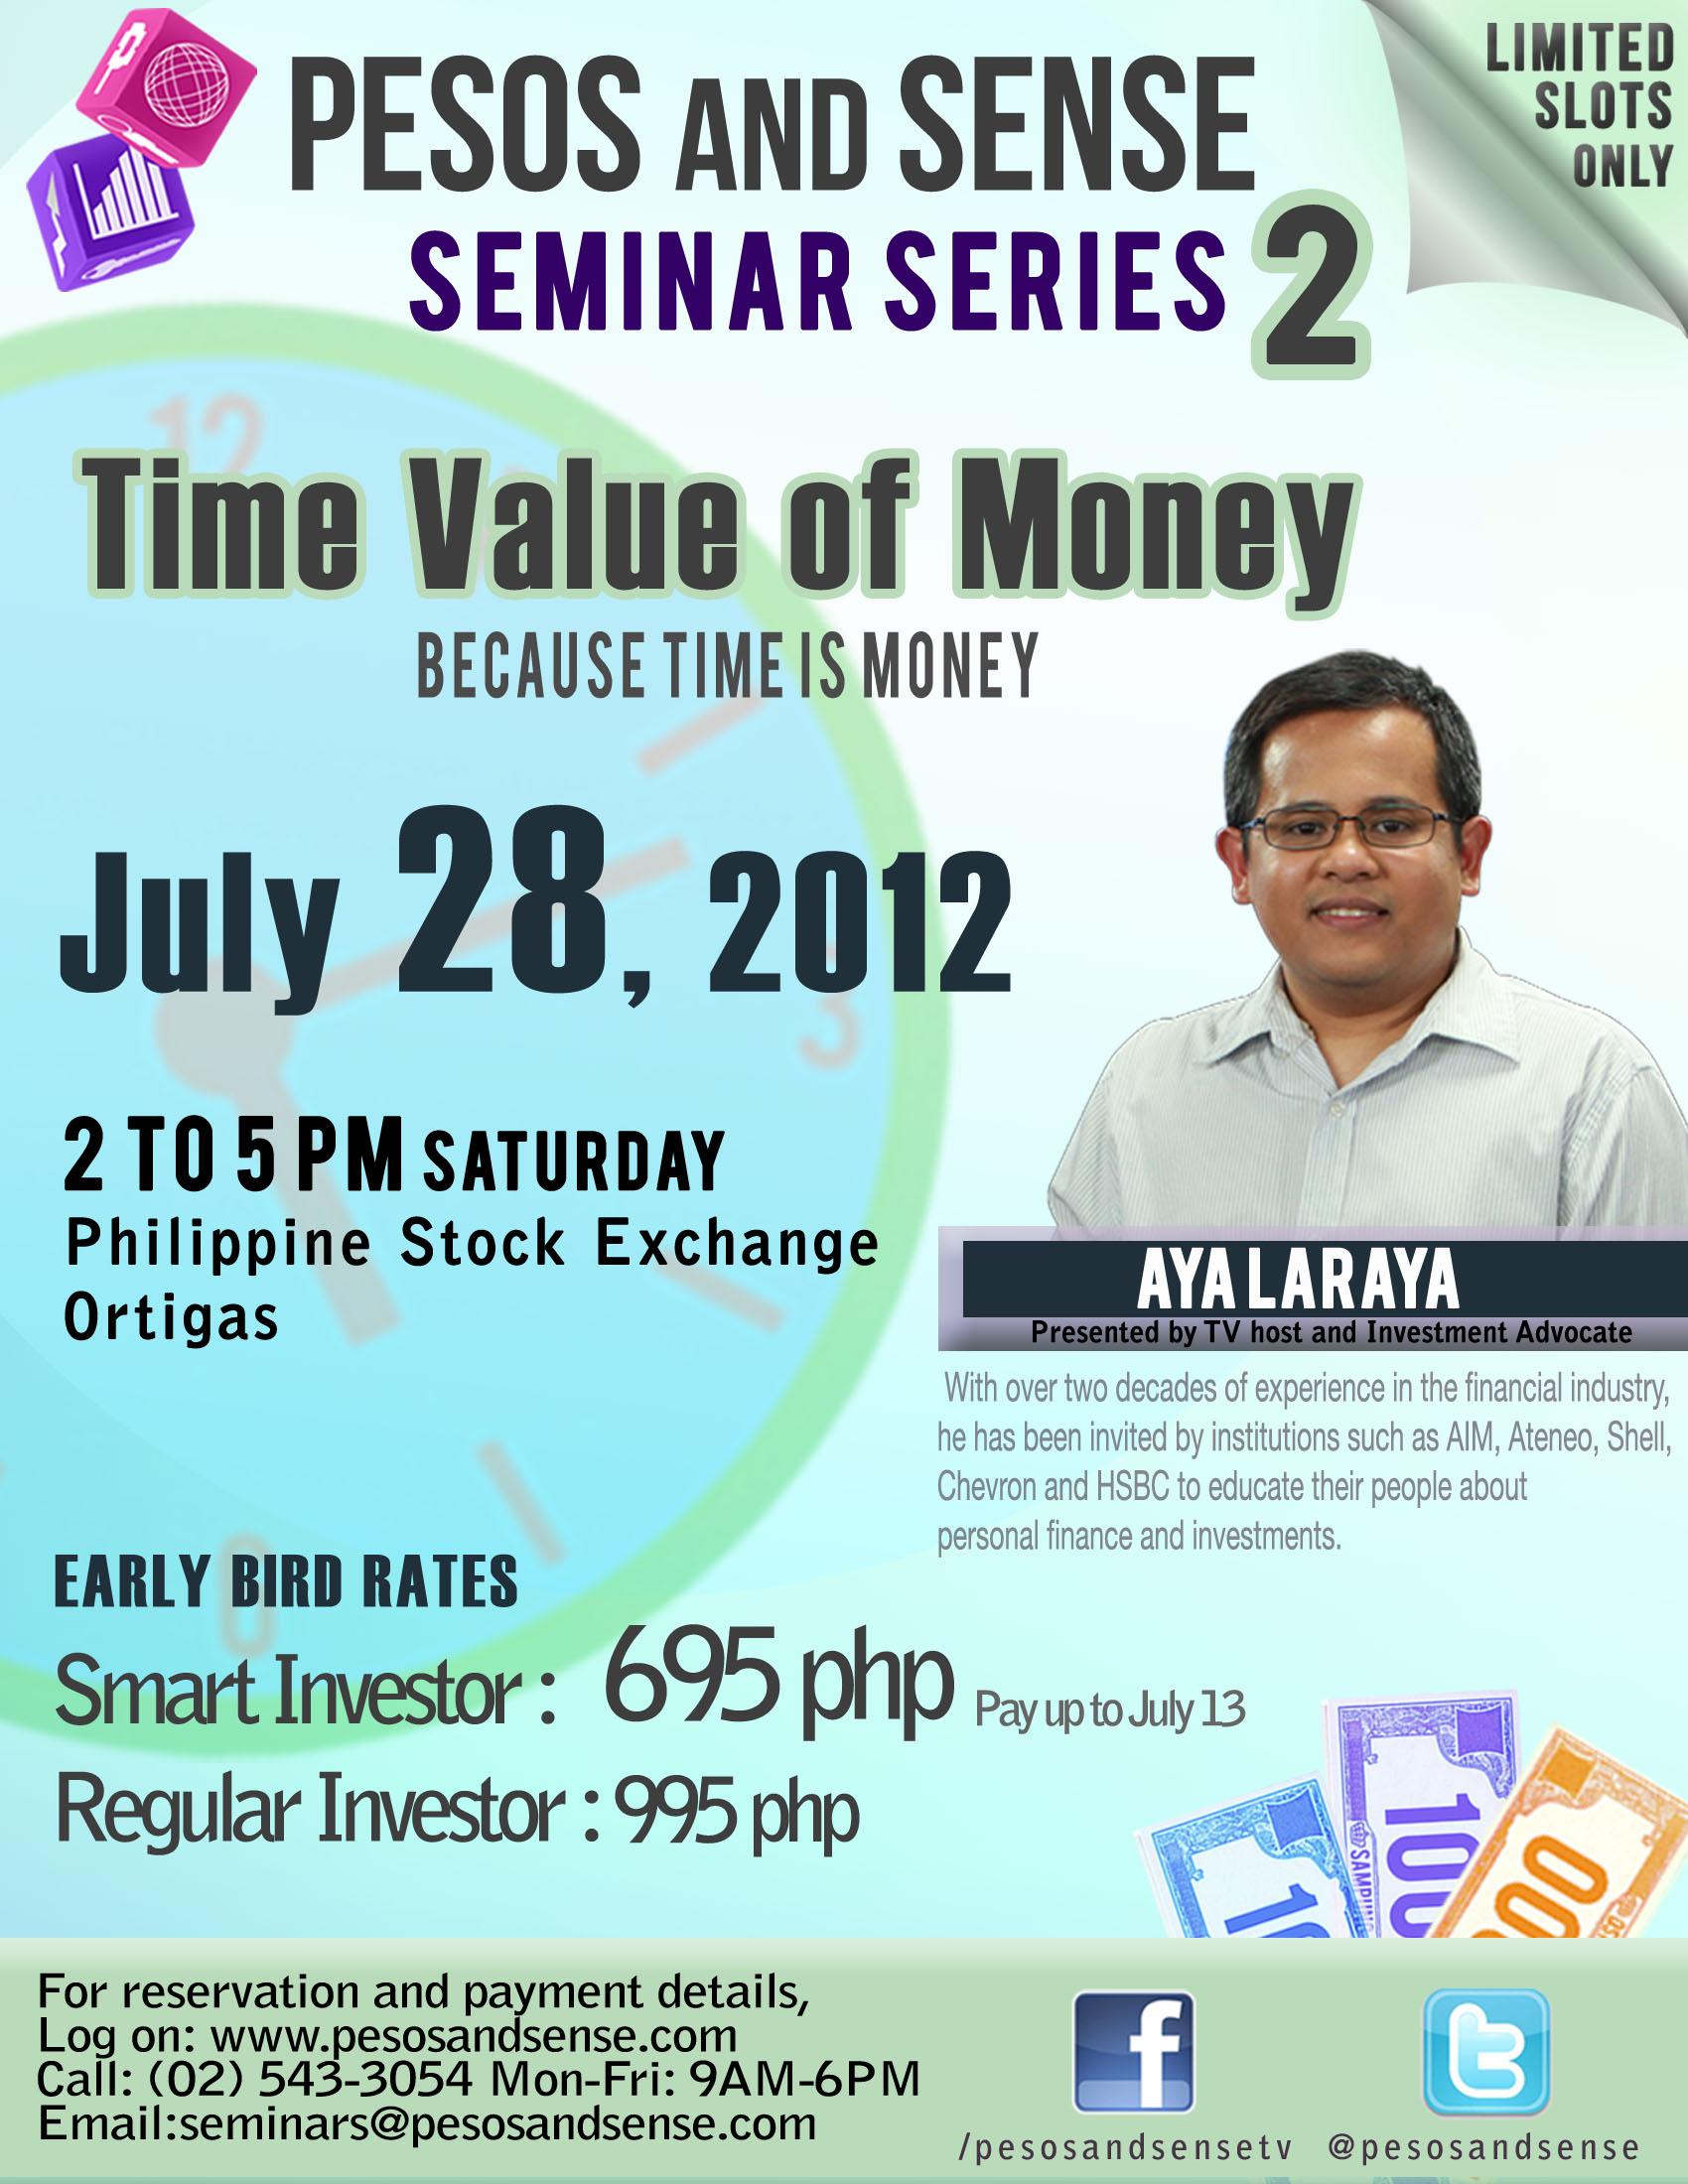 aff55507666 time value of money seminar